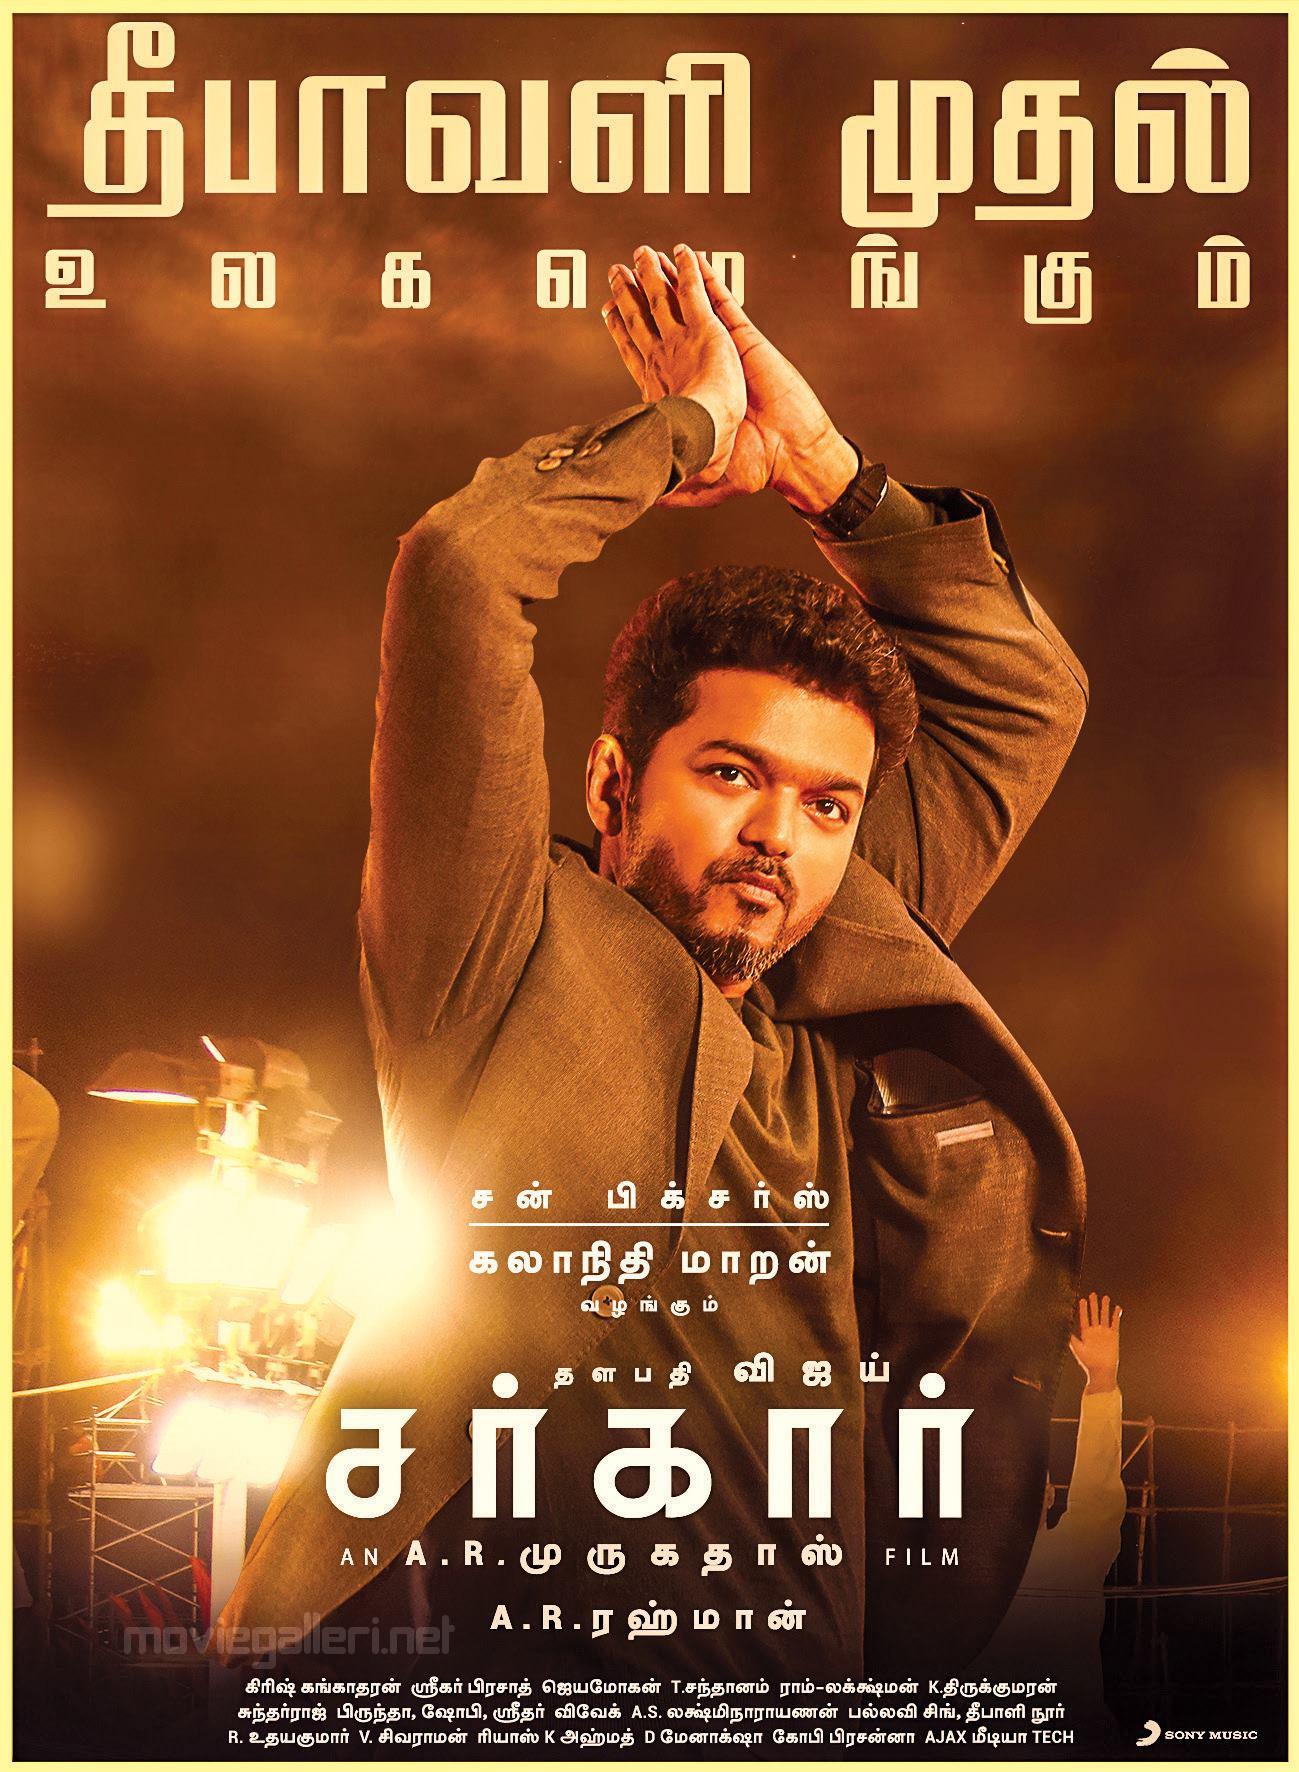 Vijay Sarkar Diwali Release Poster HD